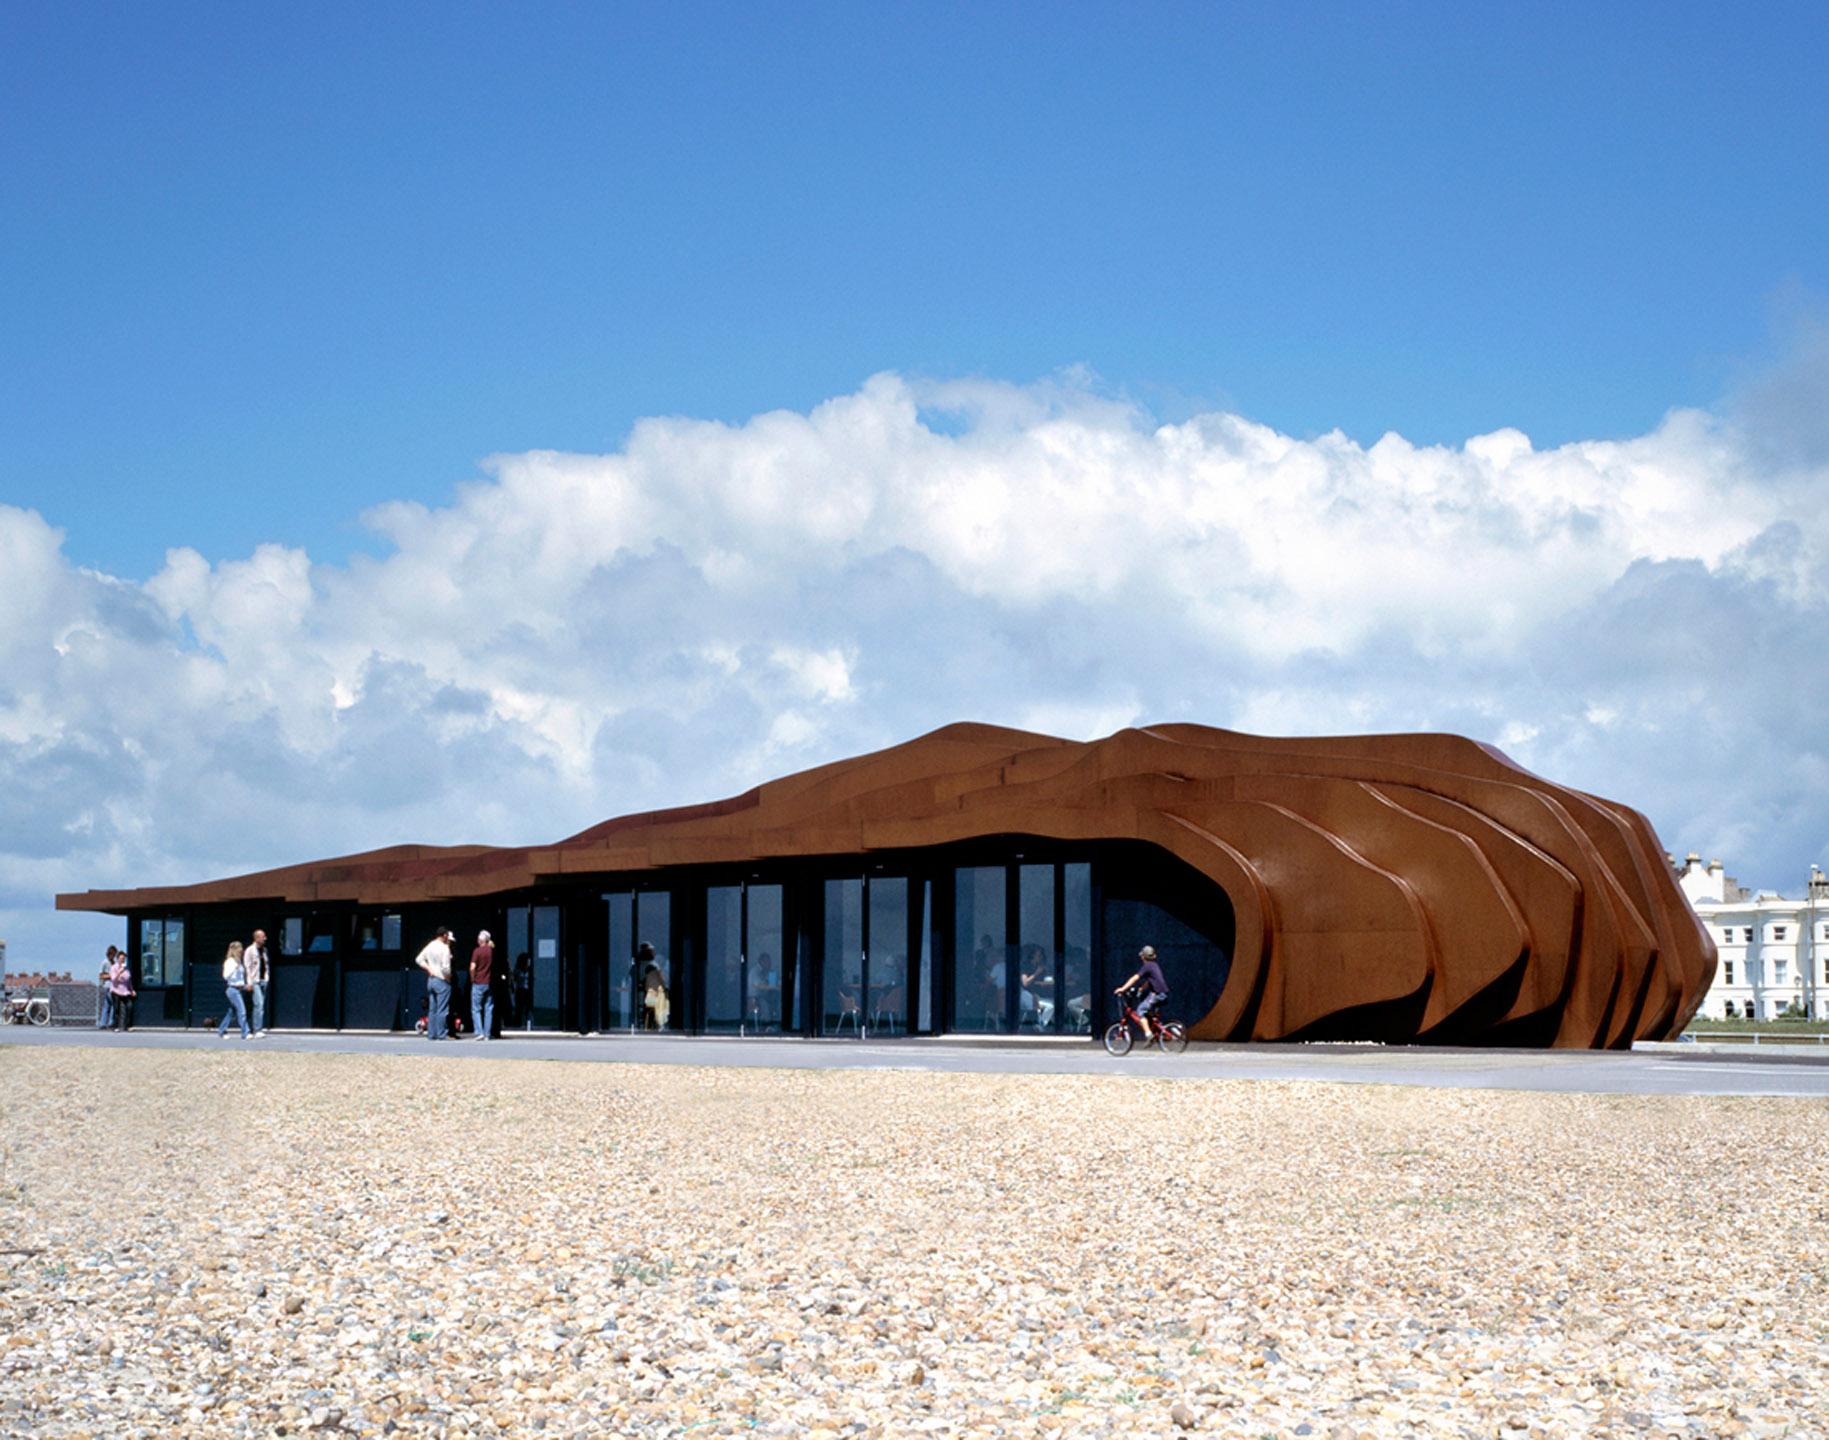 Image Source: From architect, Thomas Heatherwick